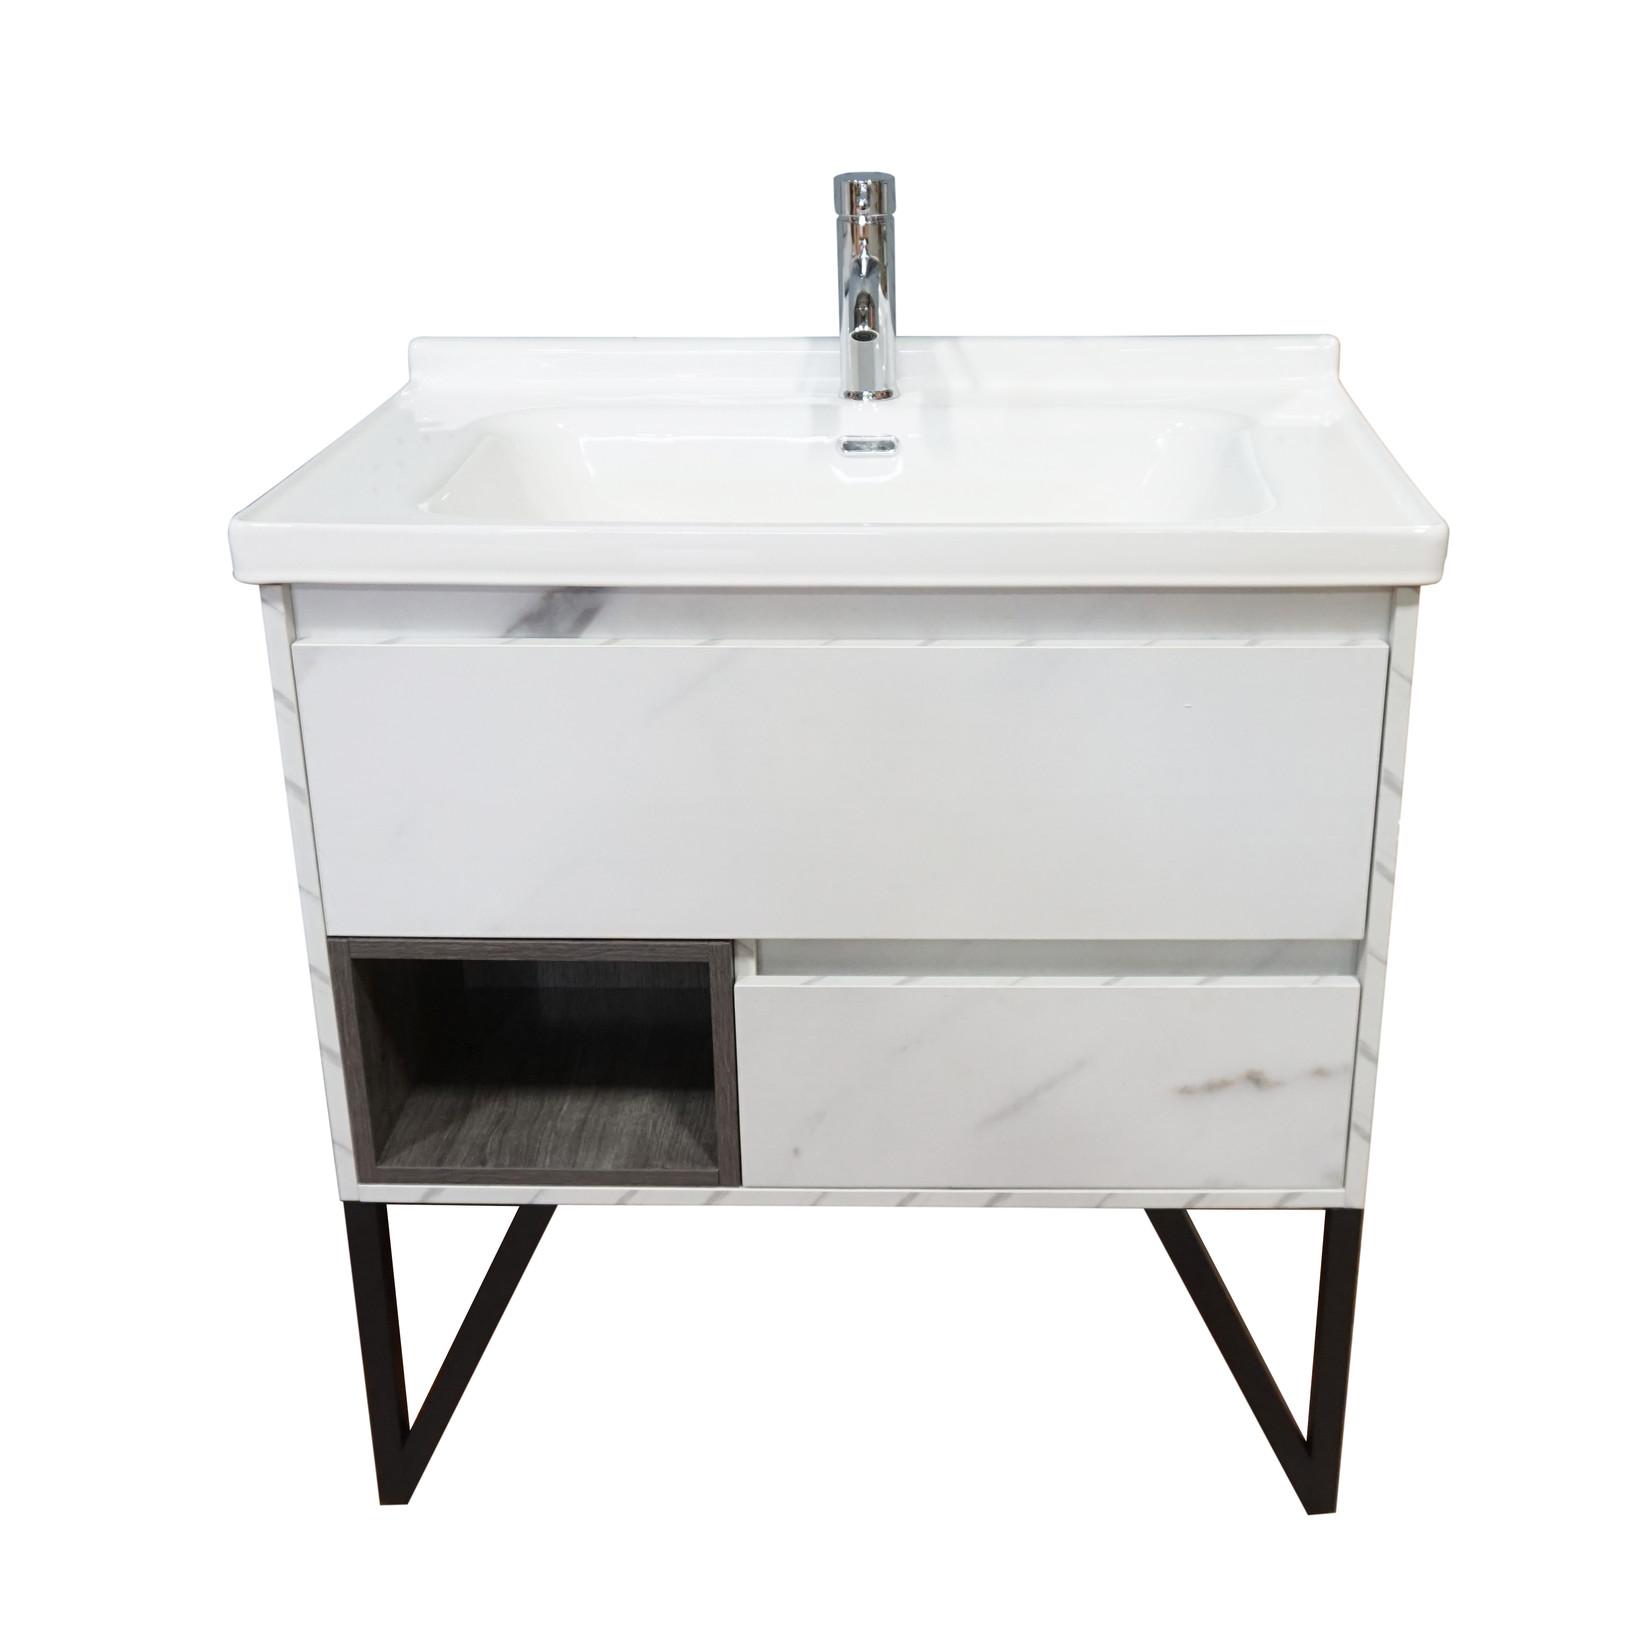 Vanity 32'' marbled white CDC 90131